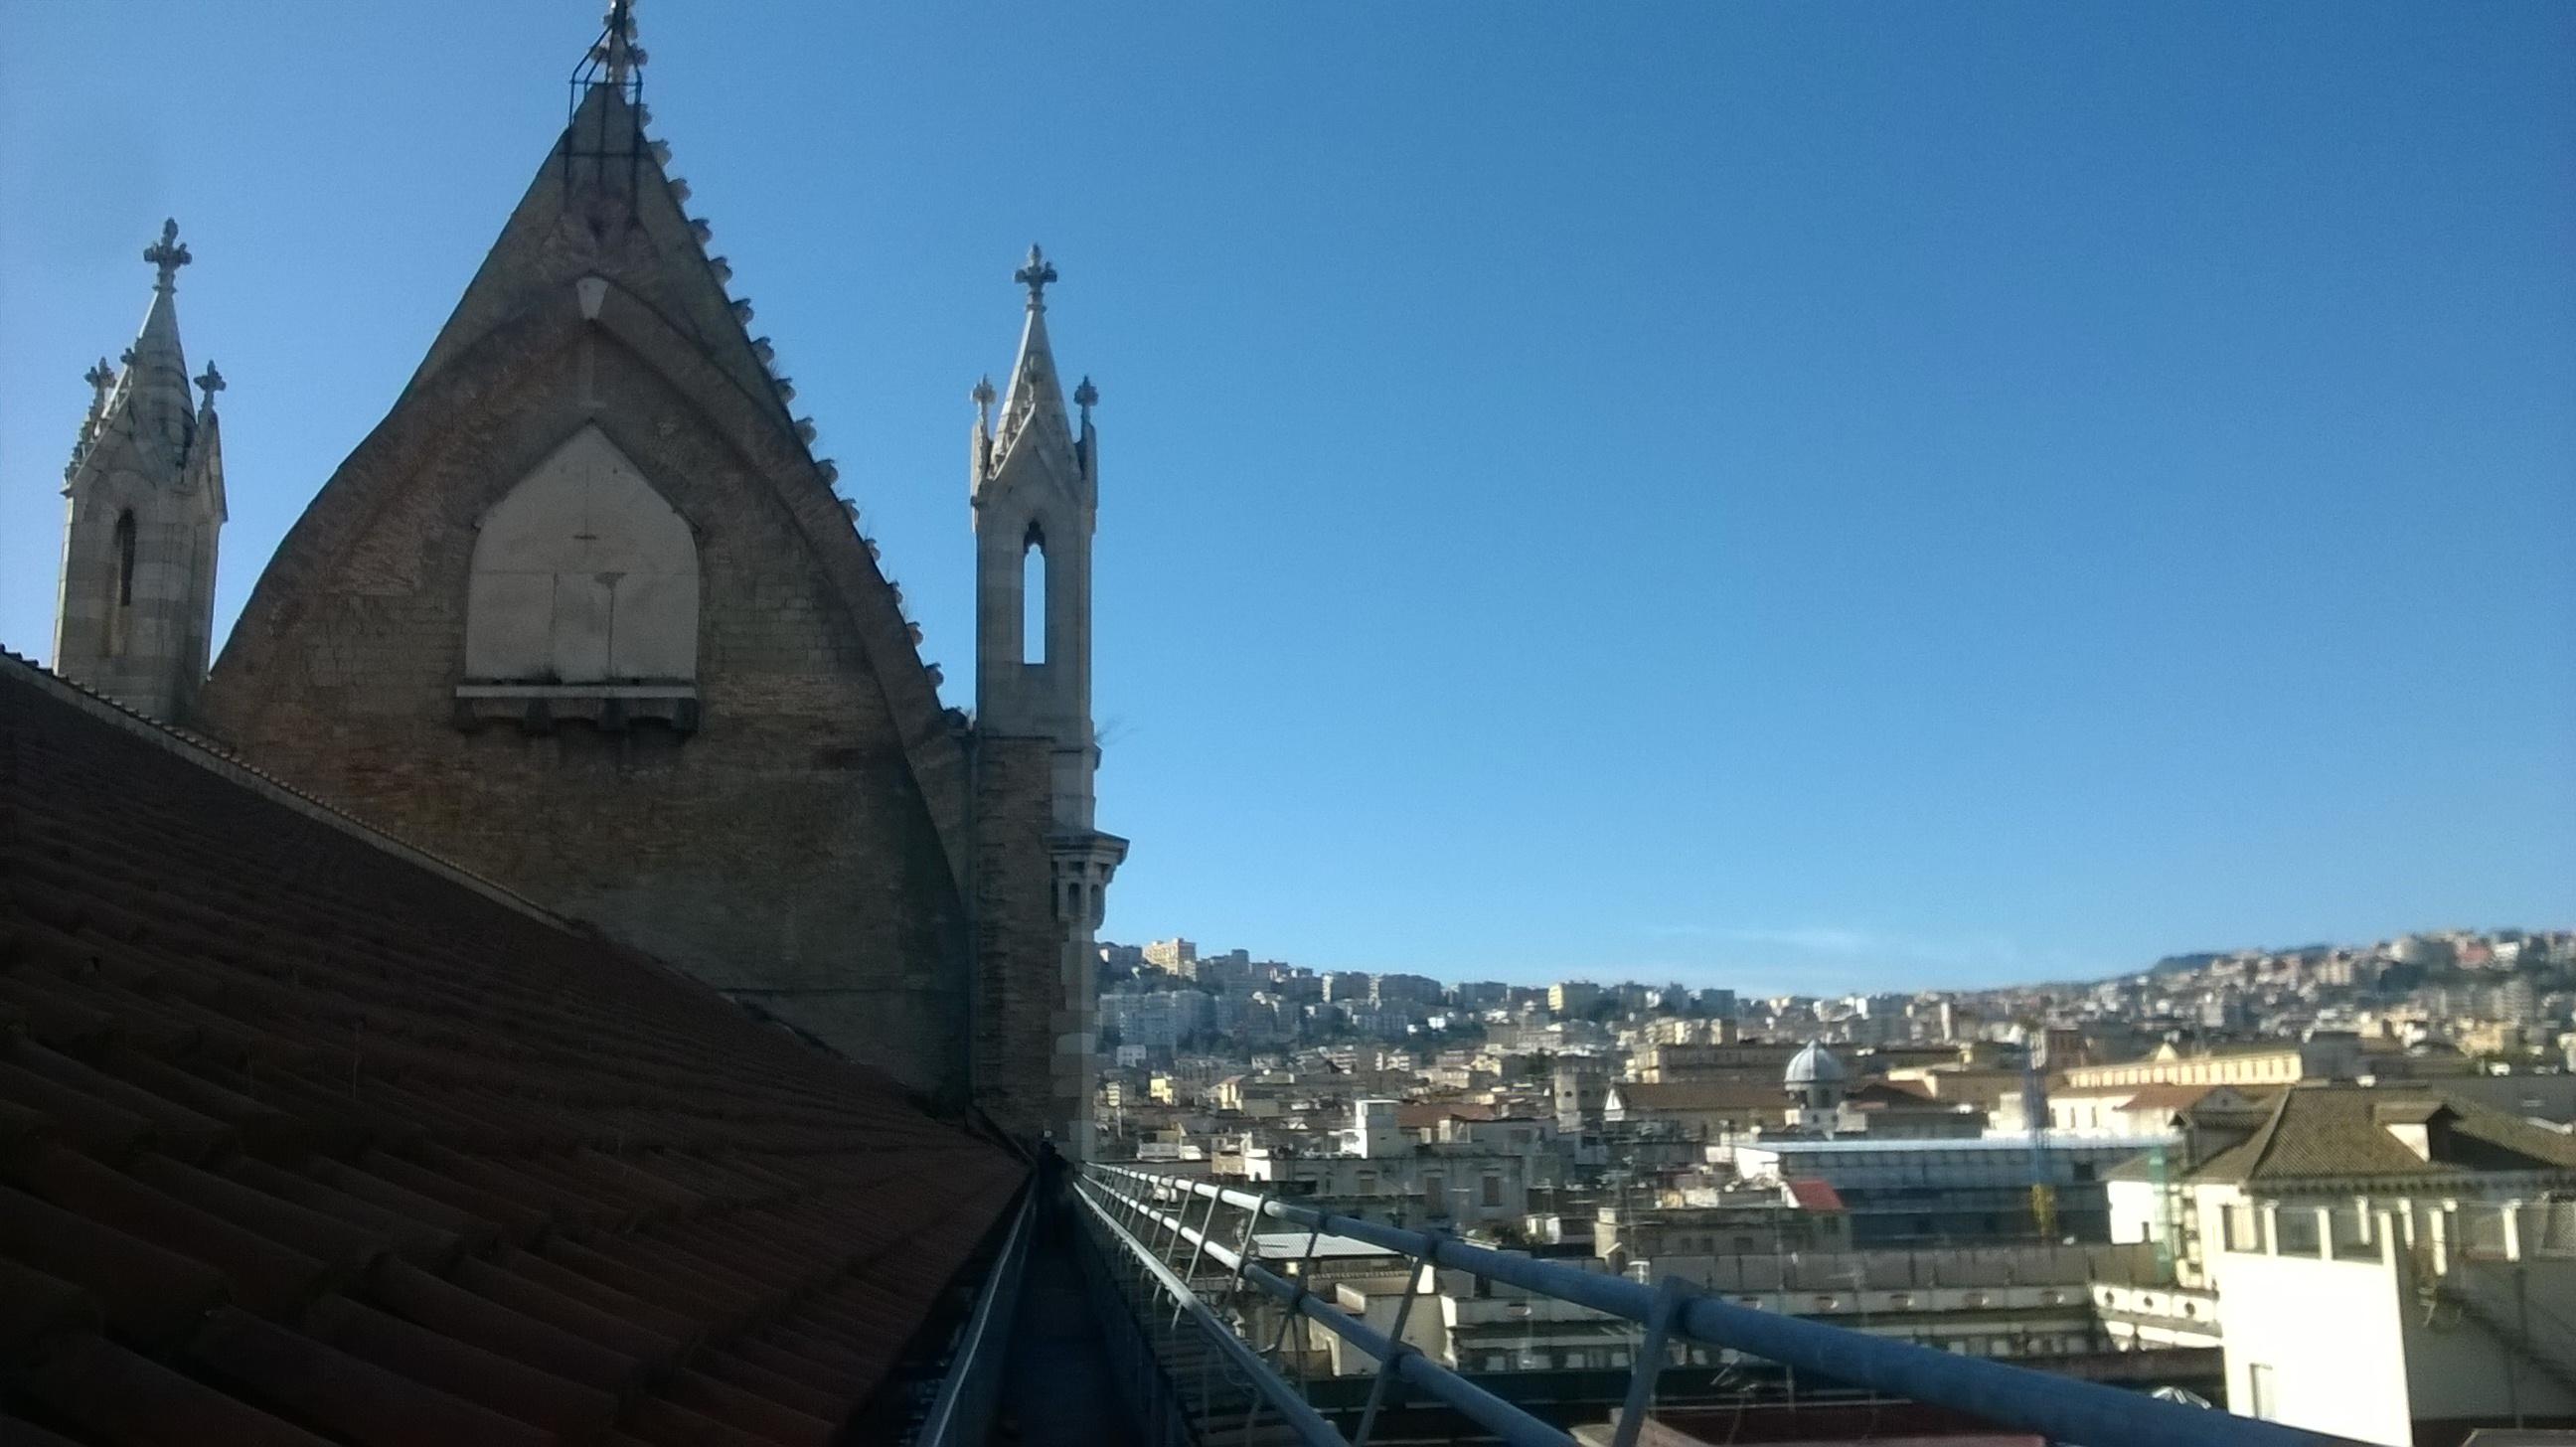 Duomo Napoli A Spasso Tra Scoperte E Panorama Mozzafiato